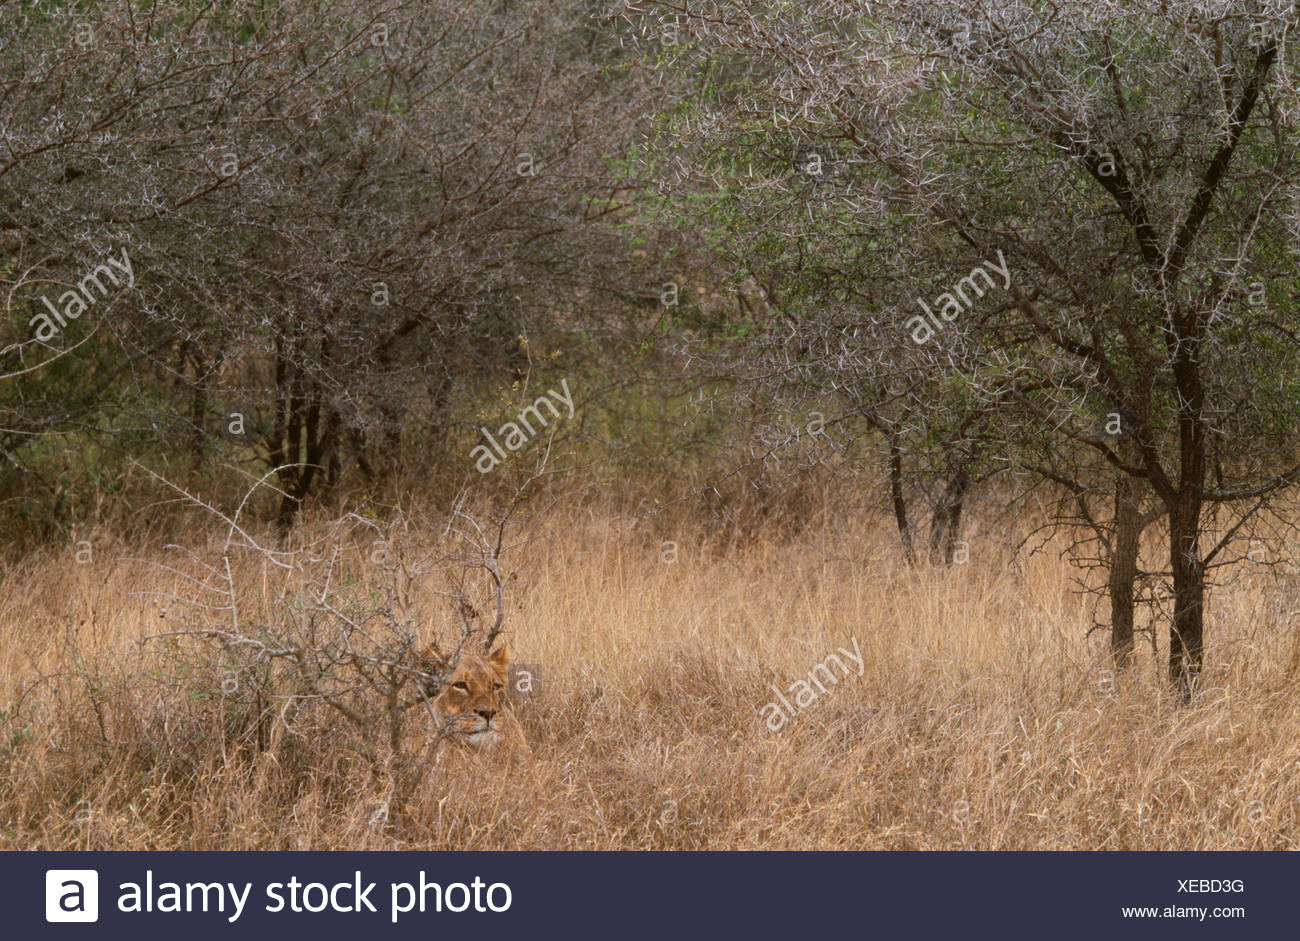 Afrikanischer Löwe, Tembuvate Preserve, Südafrika Stockbild